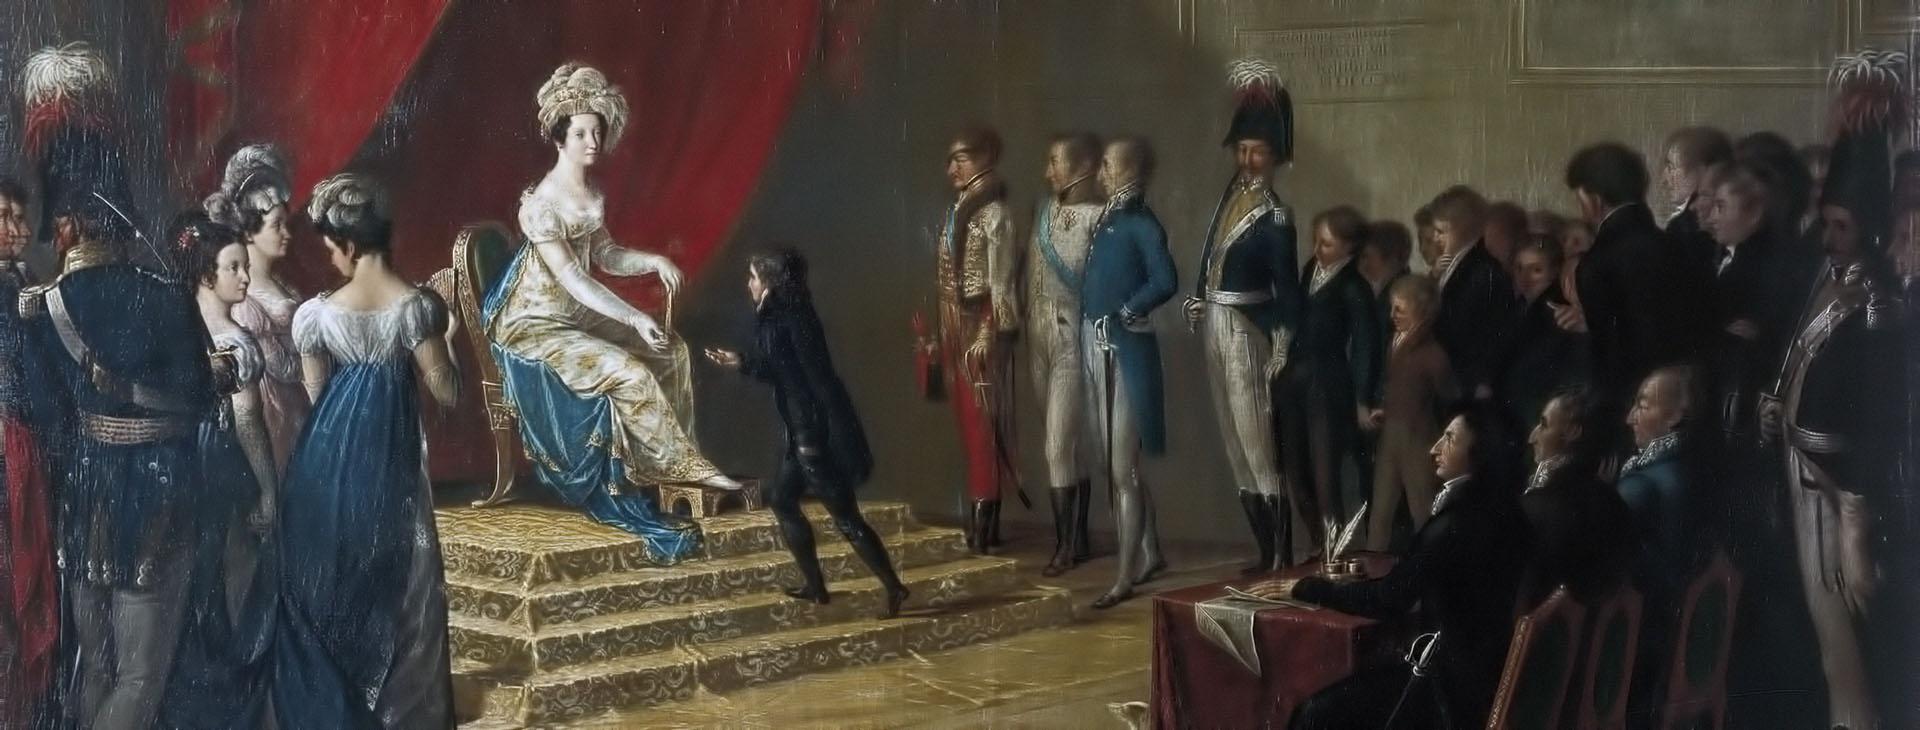 La Duchessa Maria Luigia